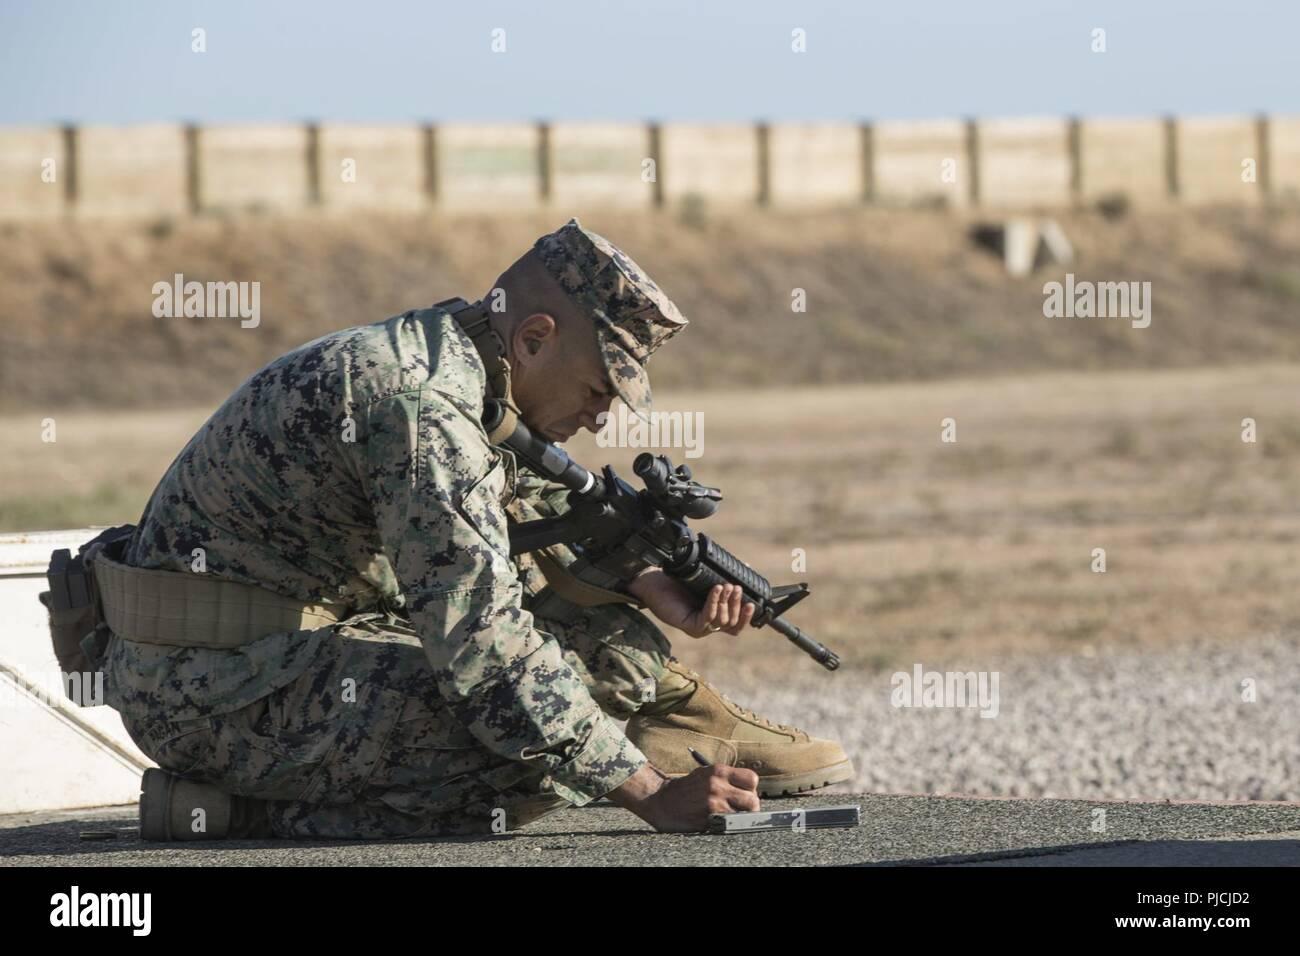 Beretta Pistol Stock S & Beretta Pistol Stock Alamy